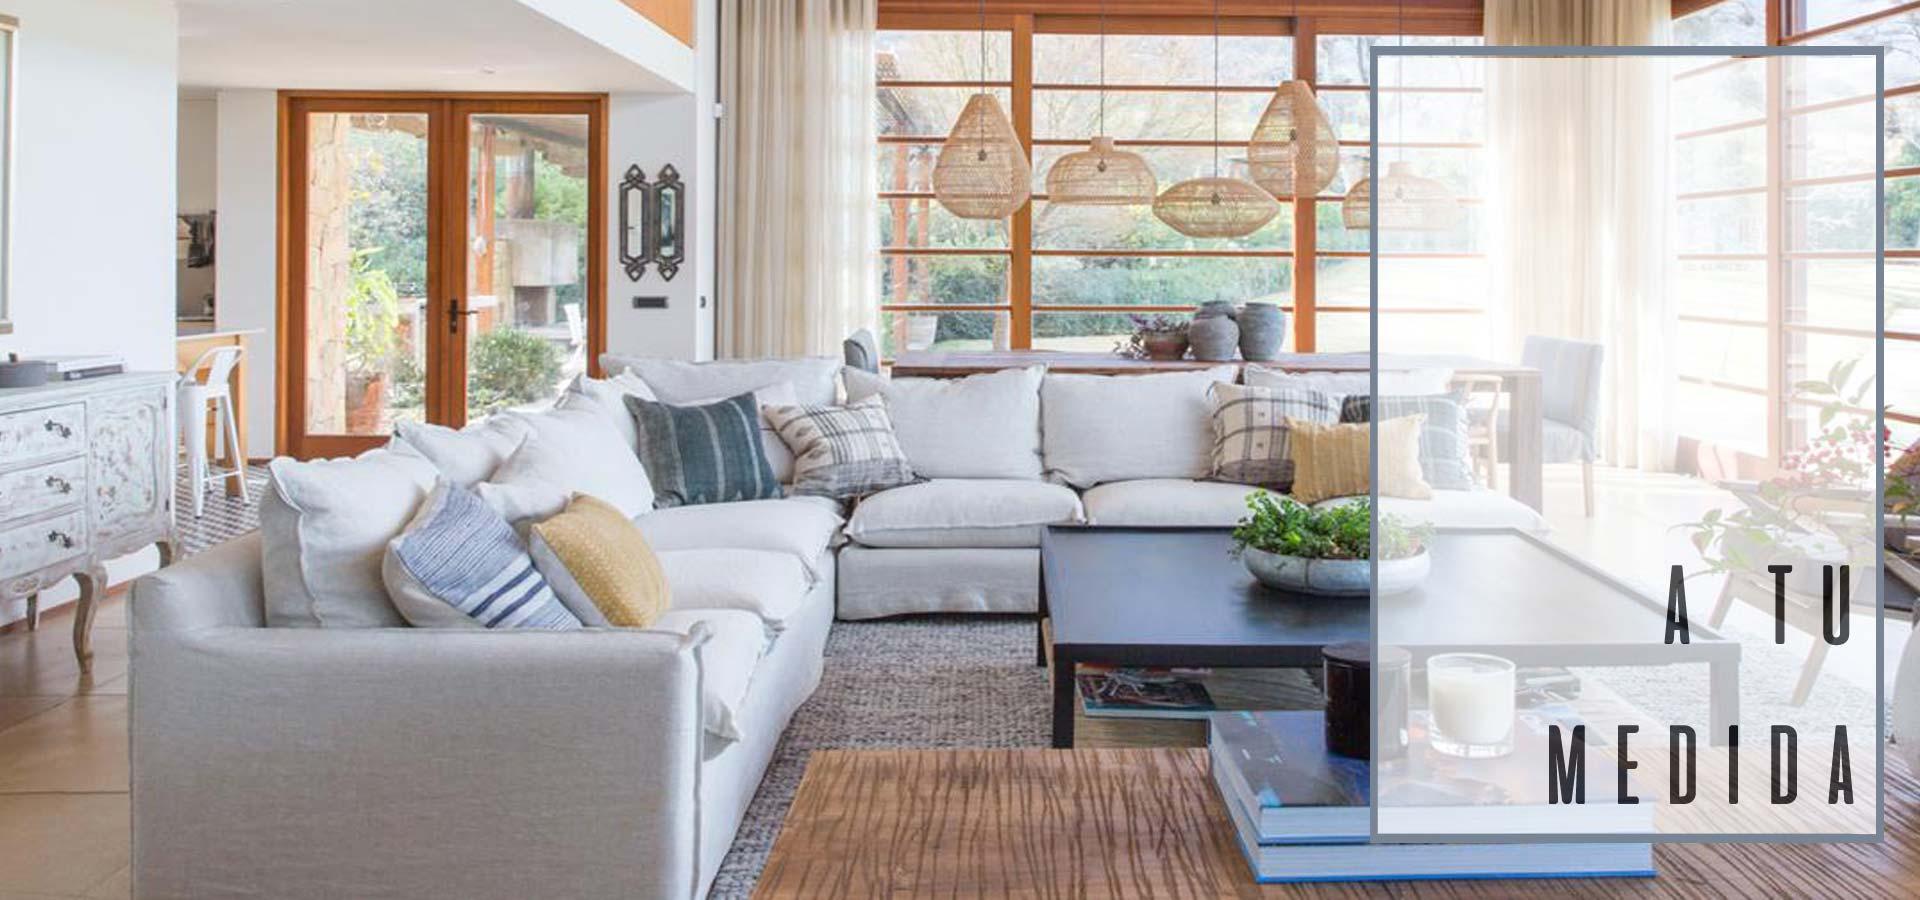 sofaonline – sofa modular a medida Emilia